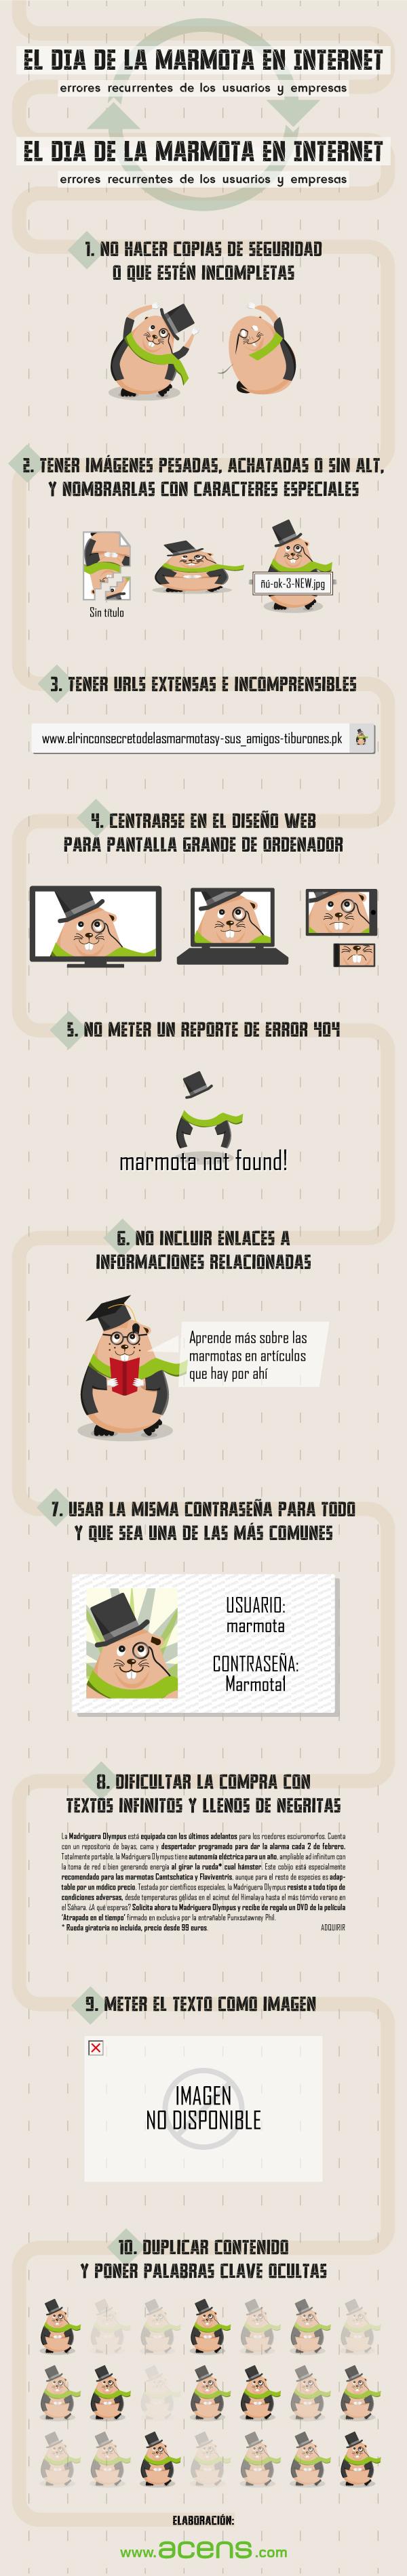 infografia-dia-marmota-blog-jesus-marrone